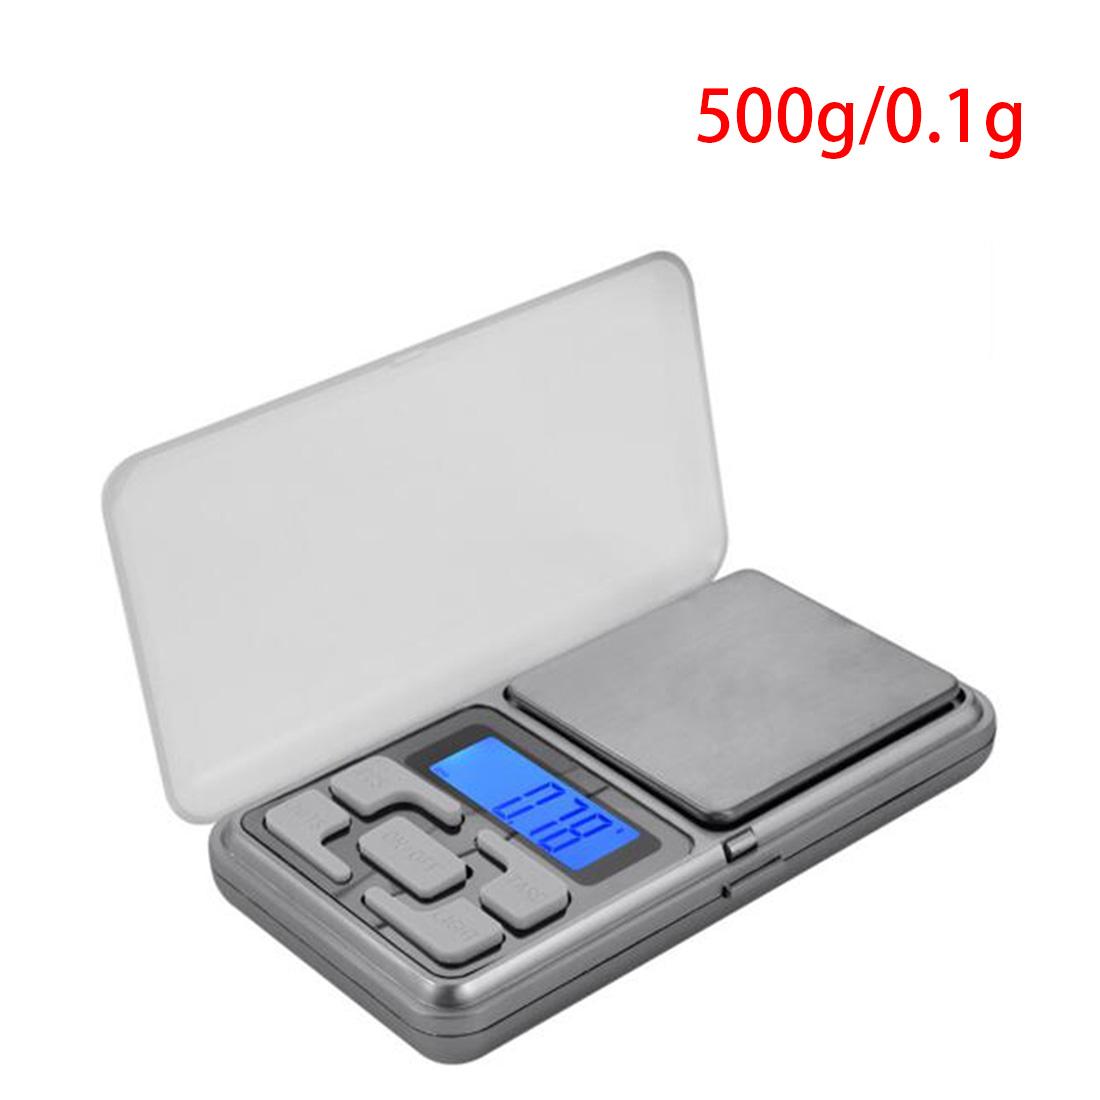 Lcd 디스플레이 0.1g x 500g 쥬얼리 무게 디지털 저울 미니 전자 저울 균형 포켓 주방 유용한 도구